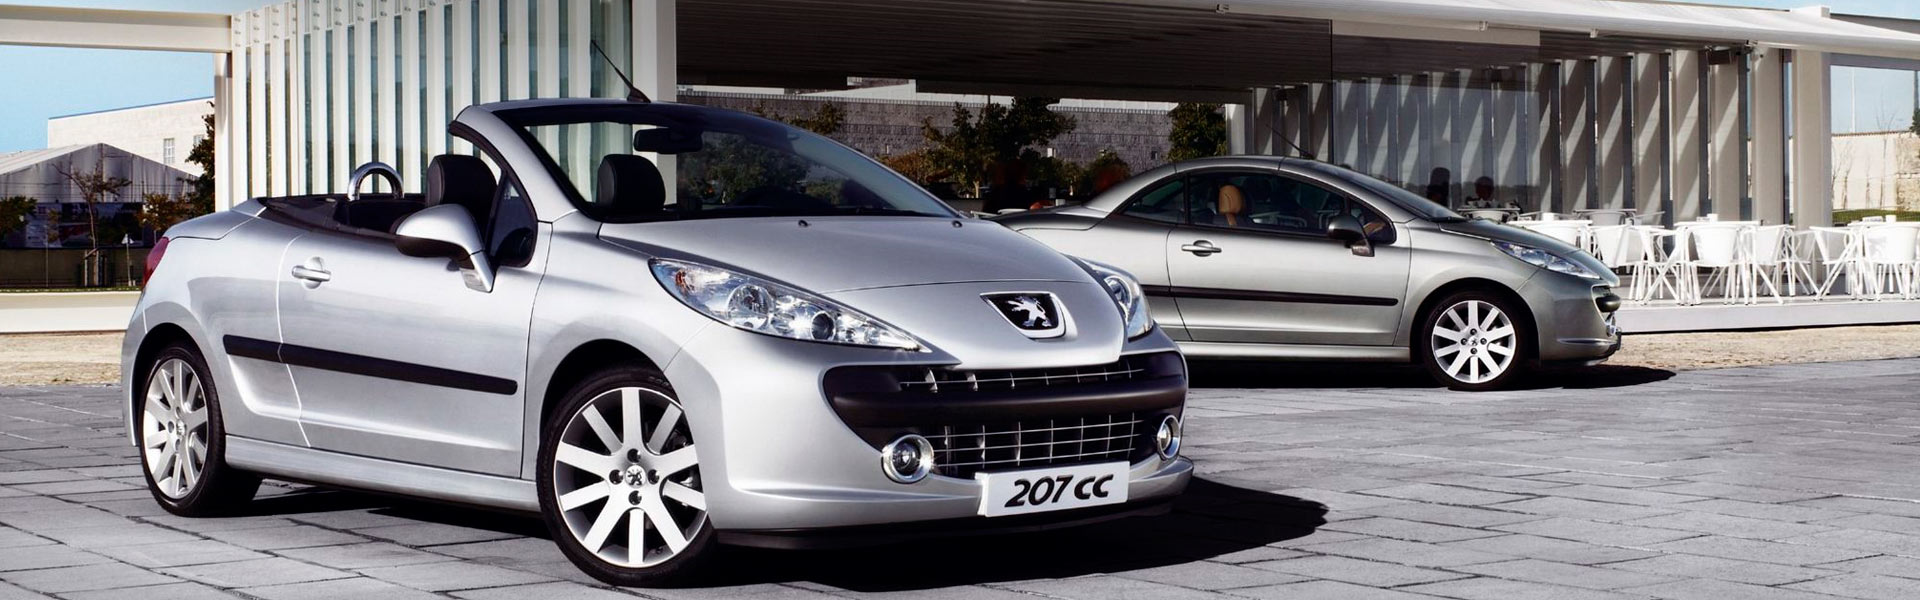 Сервис Peugeot 207